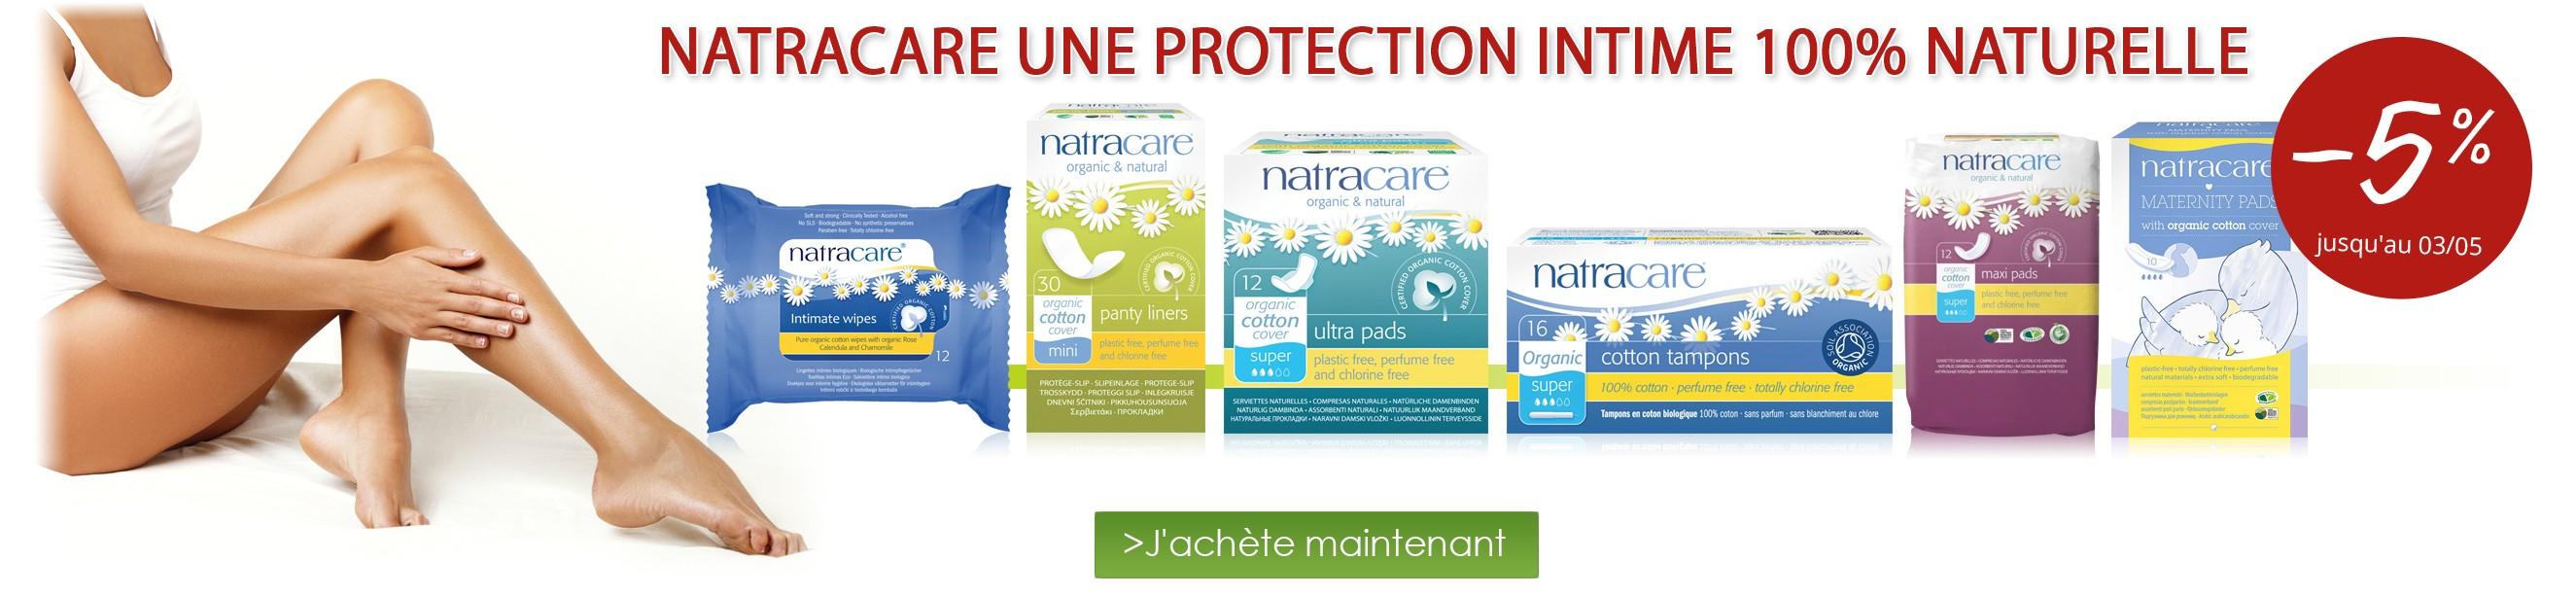 -5% sur toute la marque Natracare